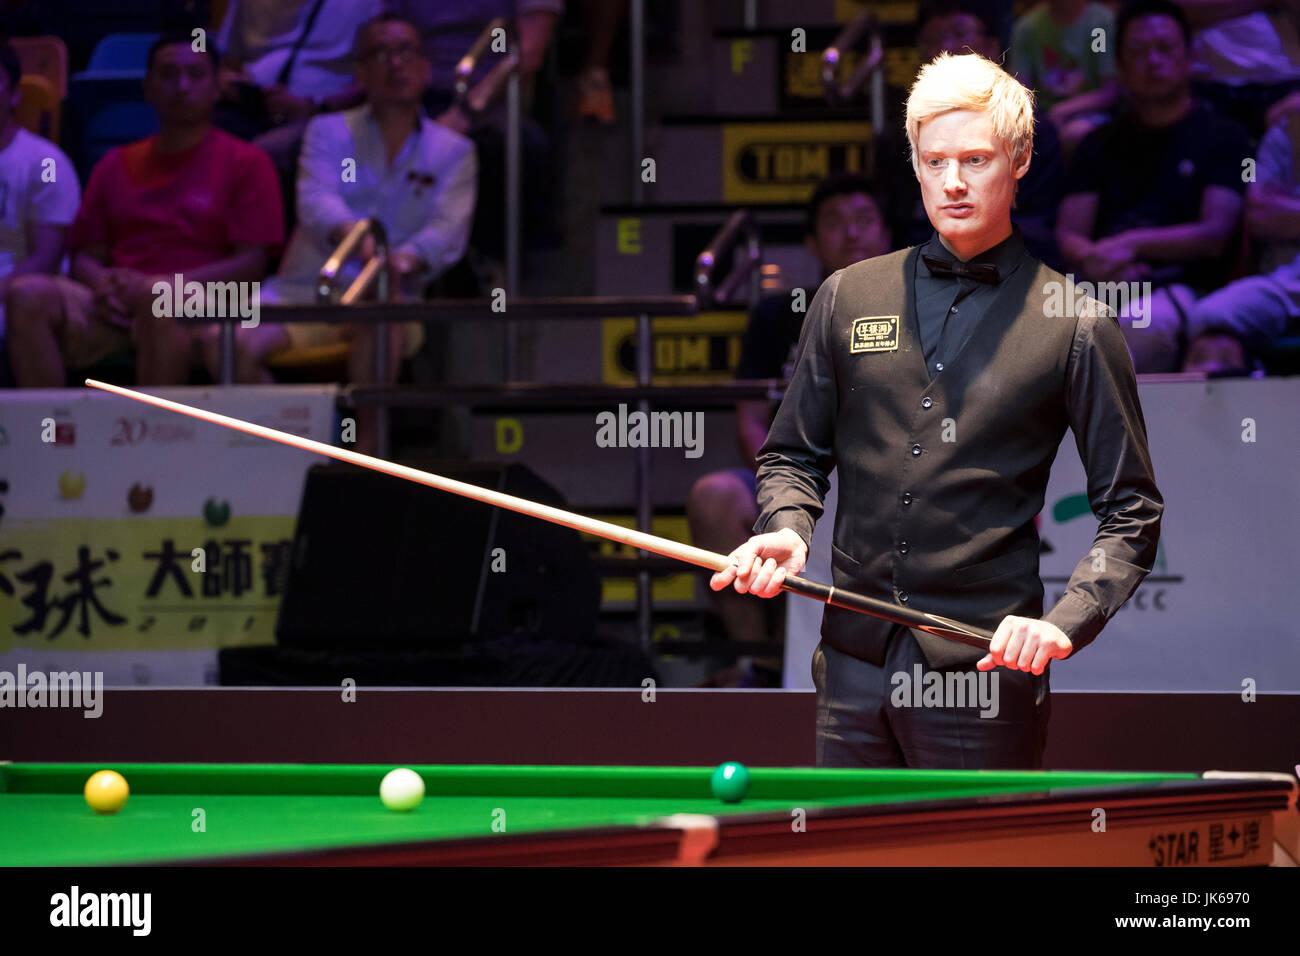 Hong Kong, Hong Kong. 22nd July 2017. Neil Robertson of Australia reacts during the semi-final match against Marco - Stock Image